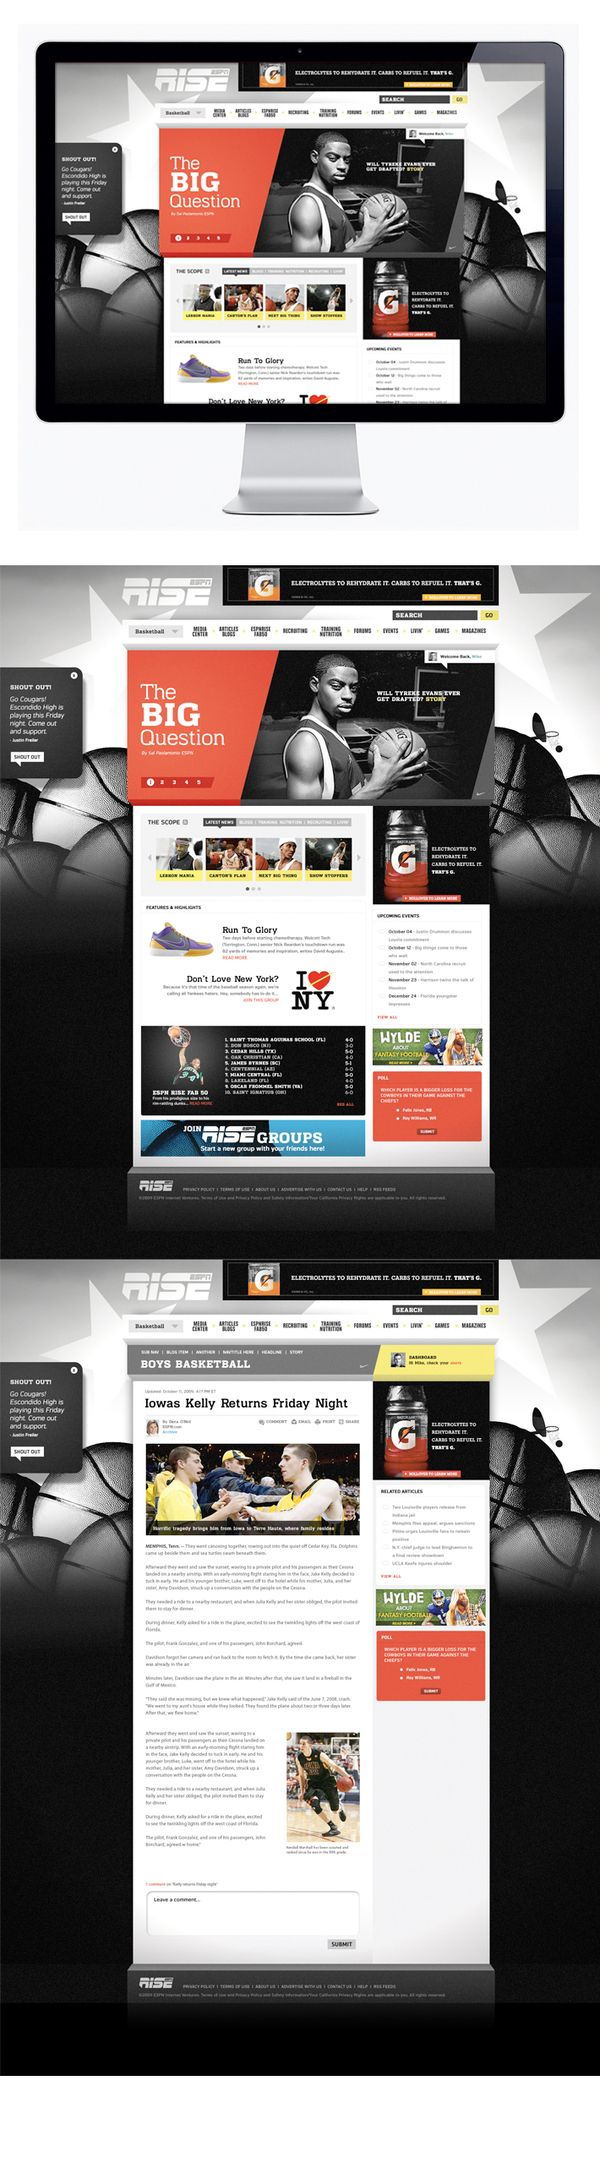 Espn Rise By Moosesyrup Via Behance Webdesign Web Design Inspiration Interactive Web Design Web Design